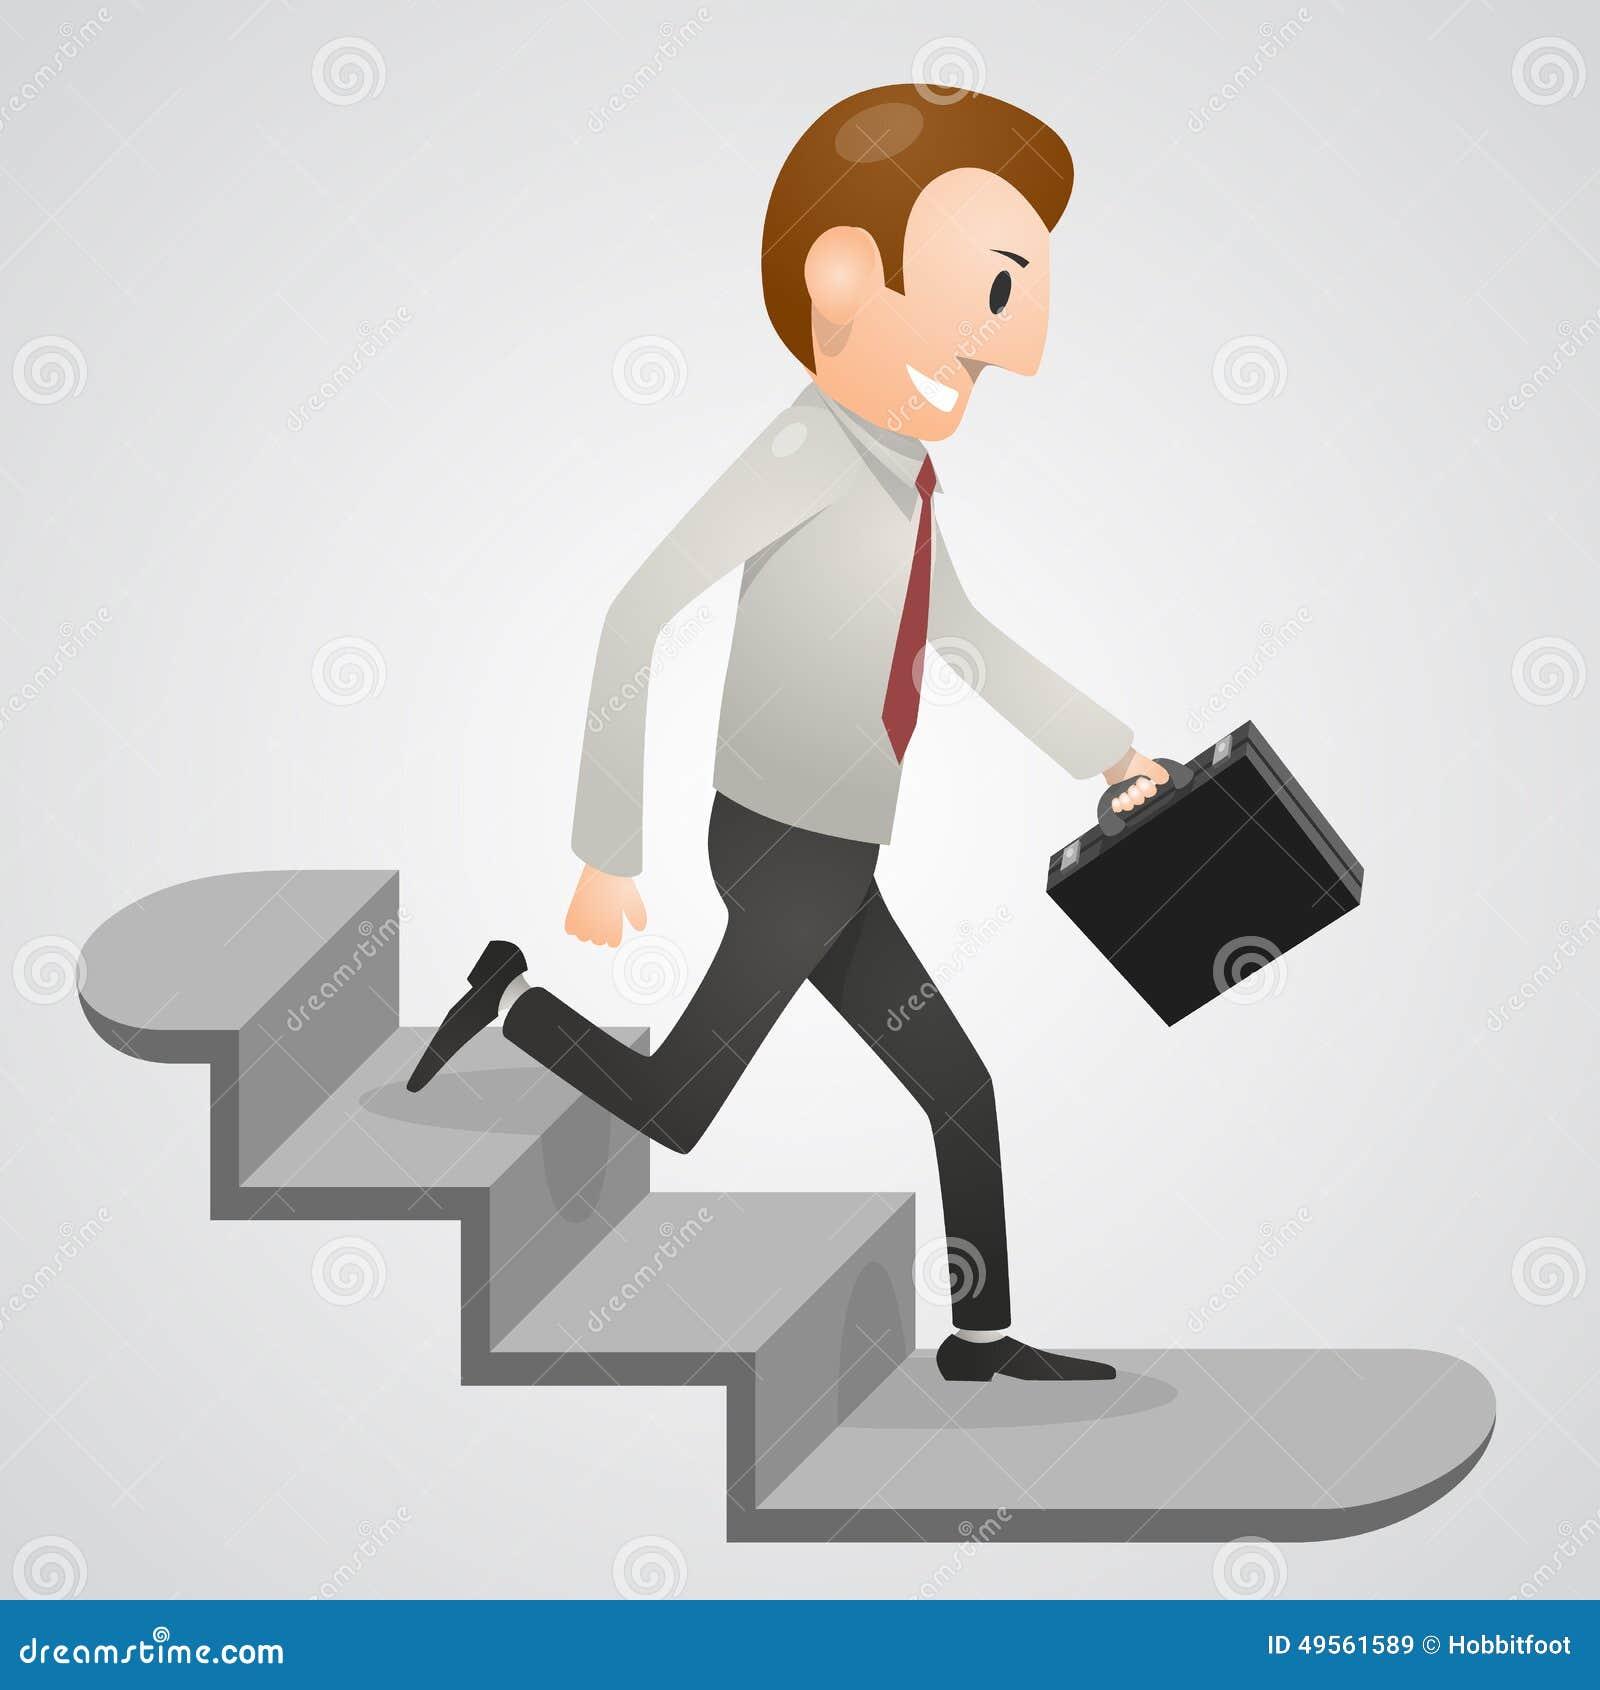 Office Man Running Downstairs Stock Vector - Illustration ...